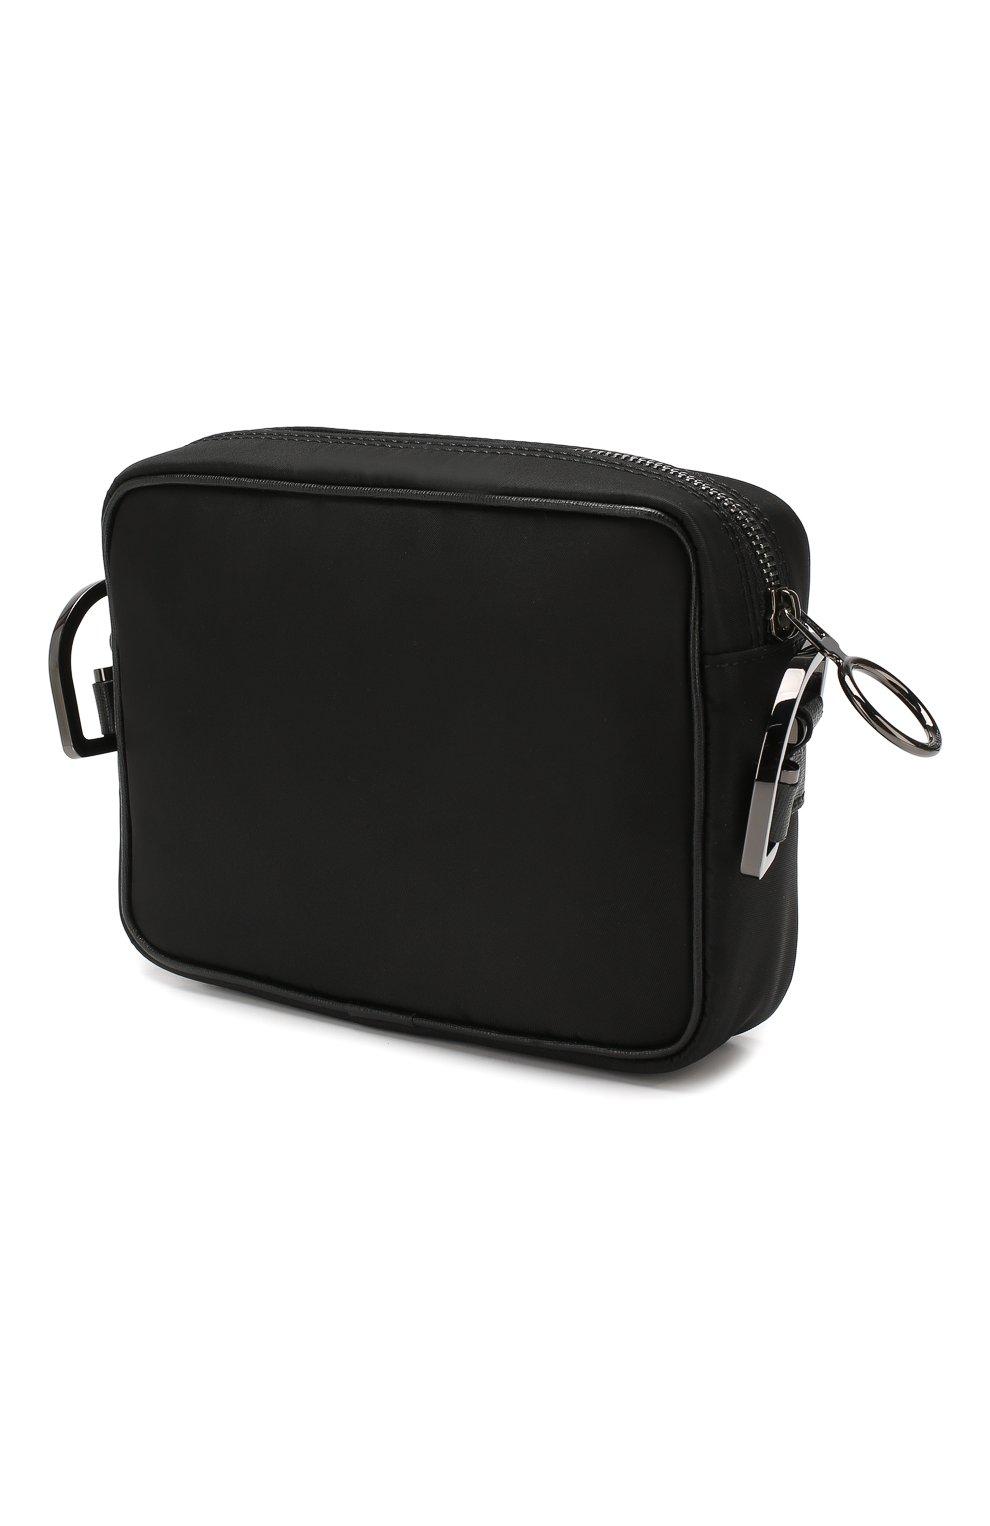 Мужская сумка OFF-WHITE черного цвета, арт. 0MNA049E19E480021000 | Фото 3